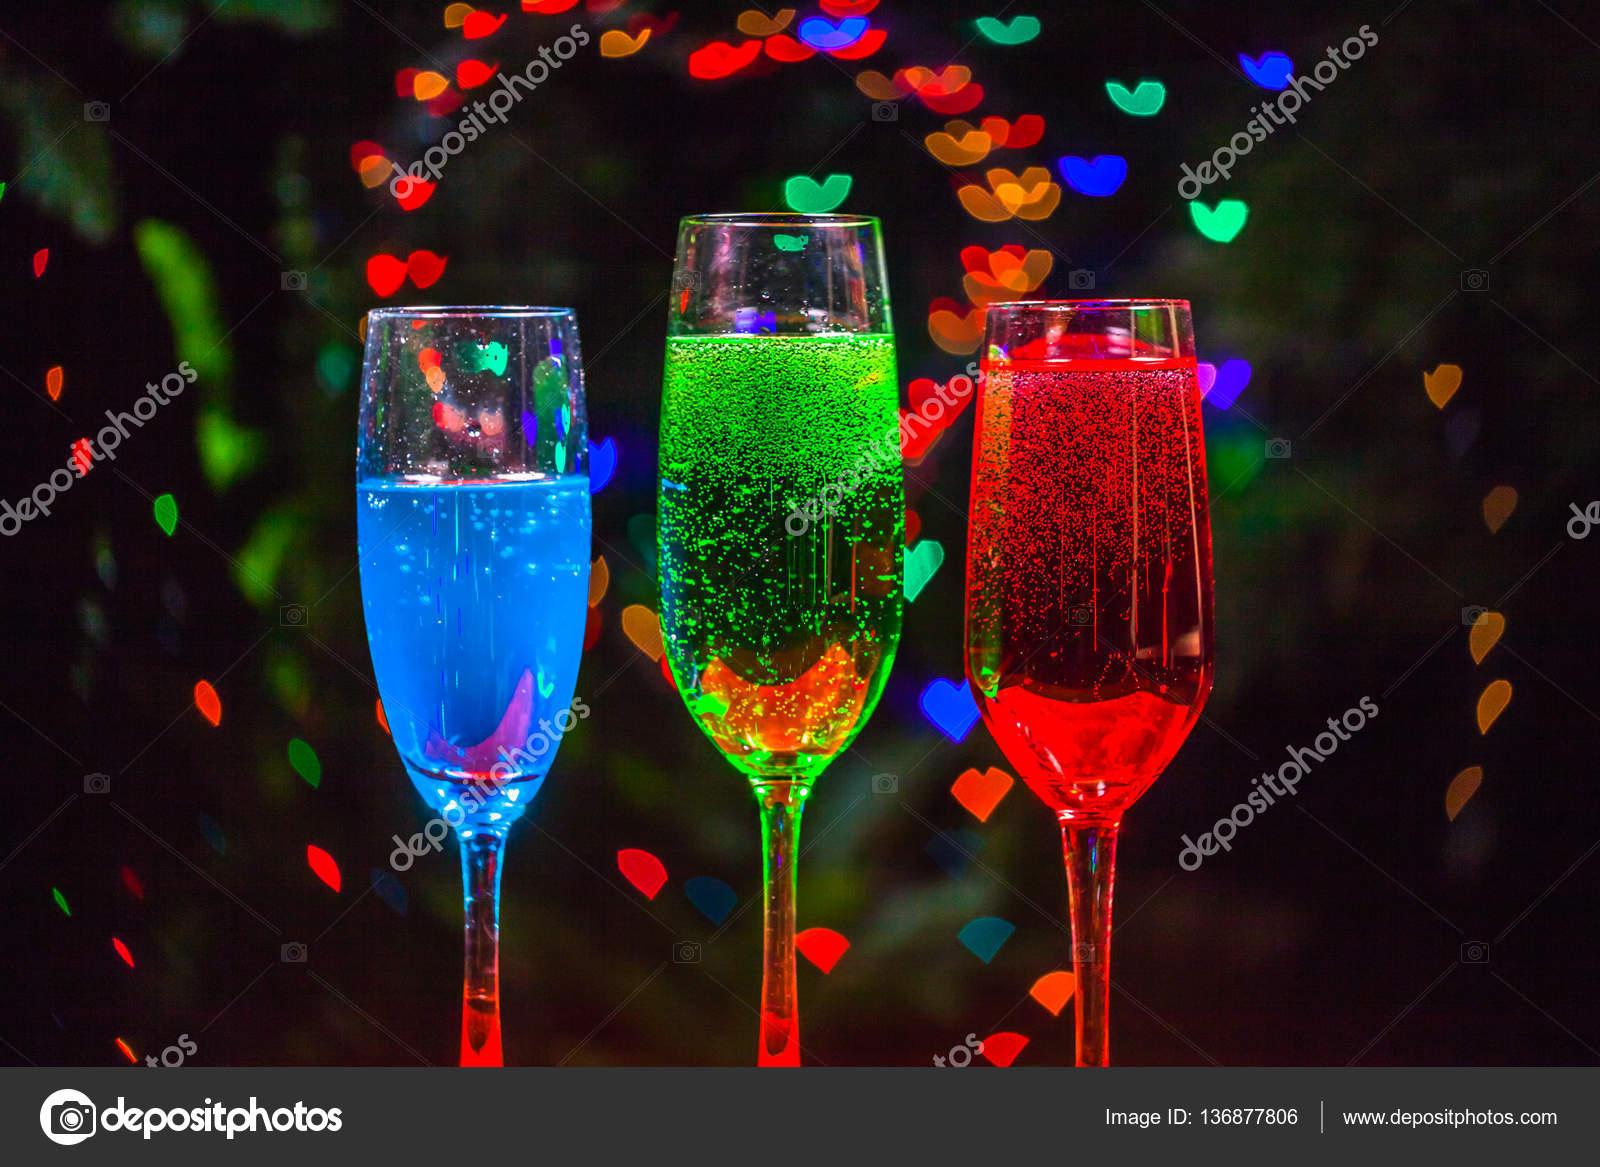 Bubble Herz in Getränk — Stockfoto © thaisign #136877806